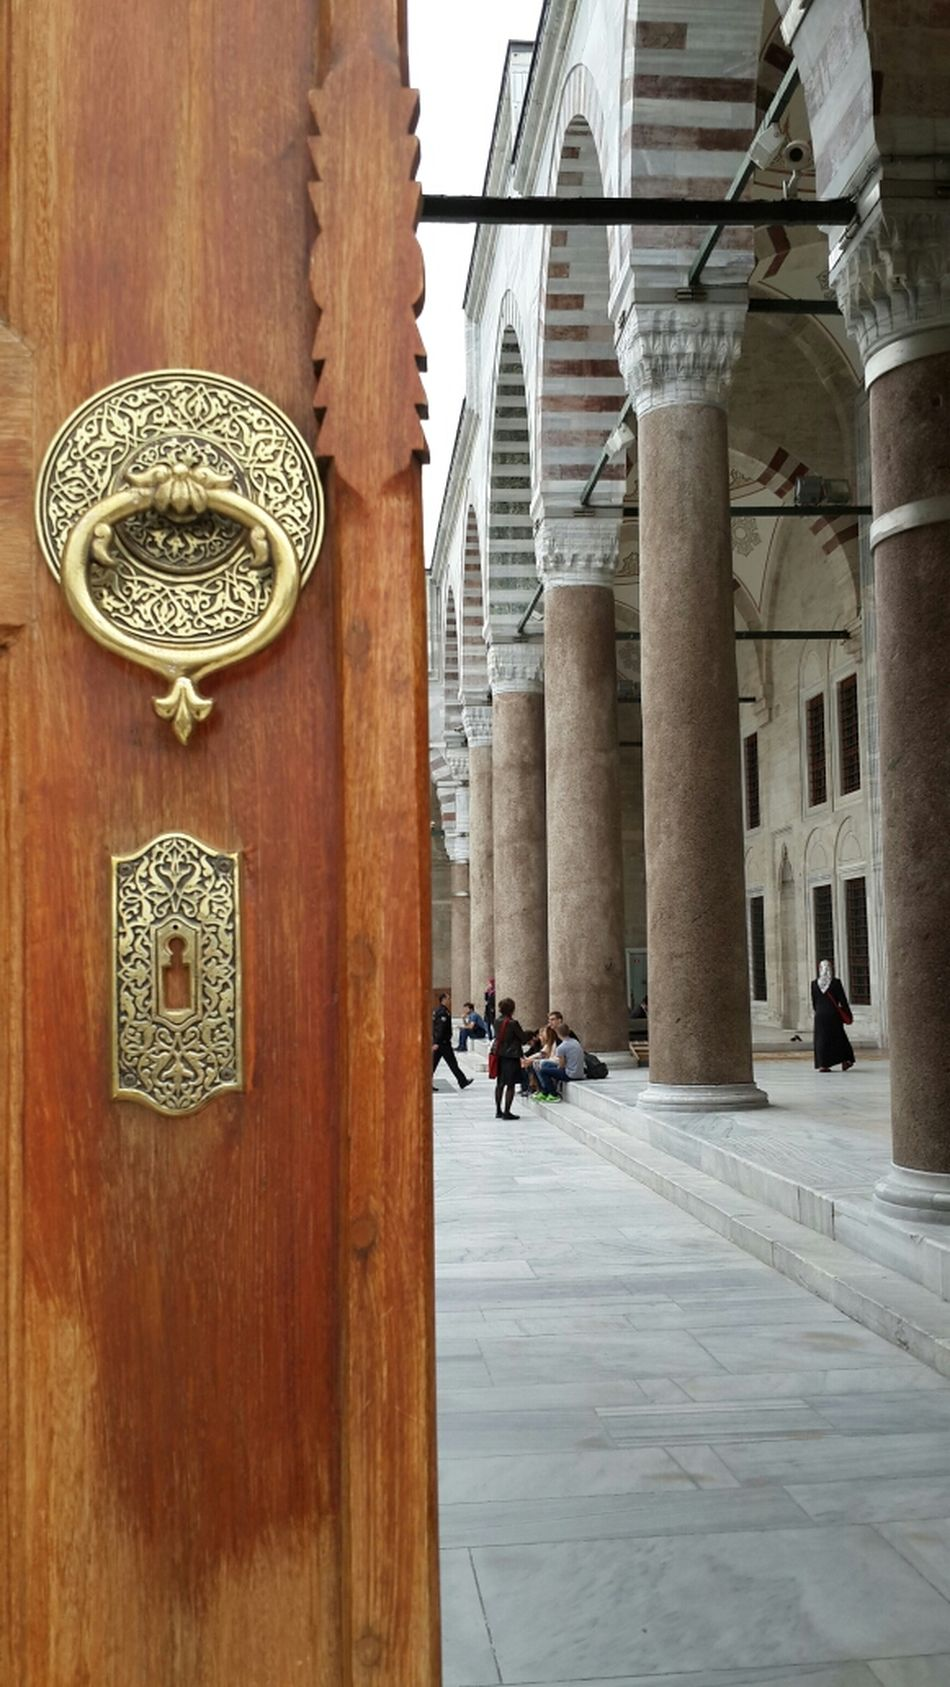 kilitsiz kapılar... Door Mosque Kilit Prayer